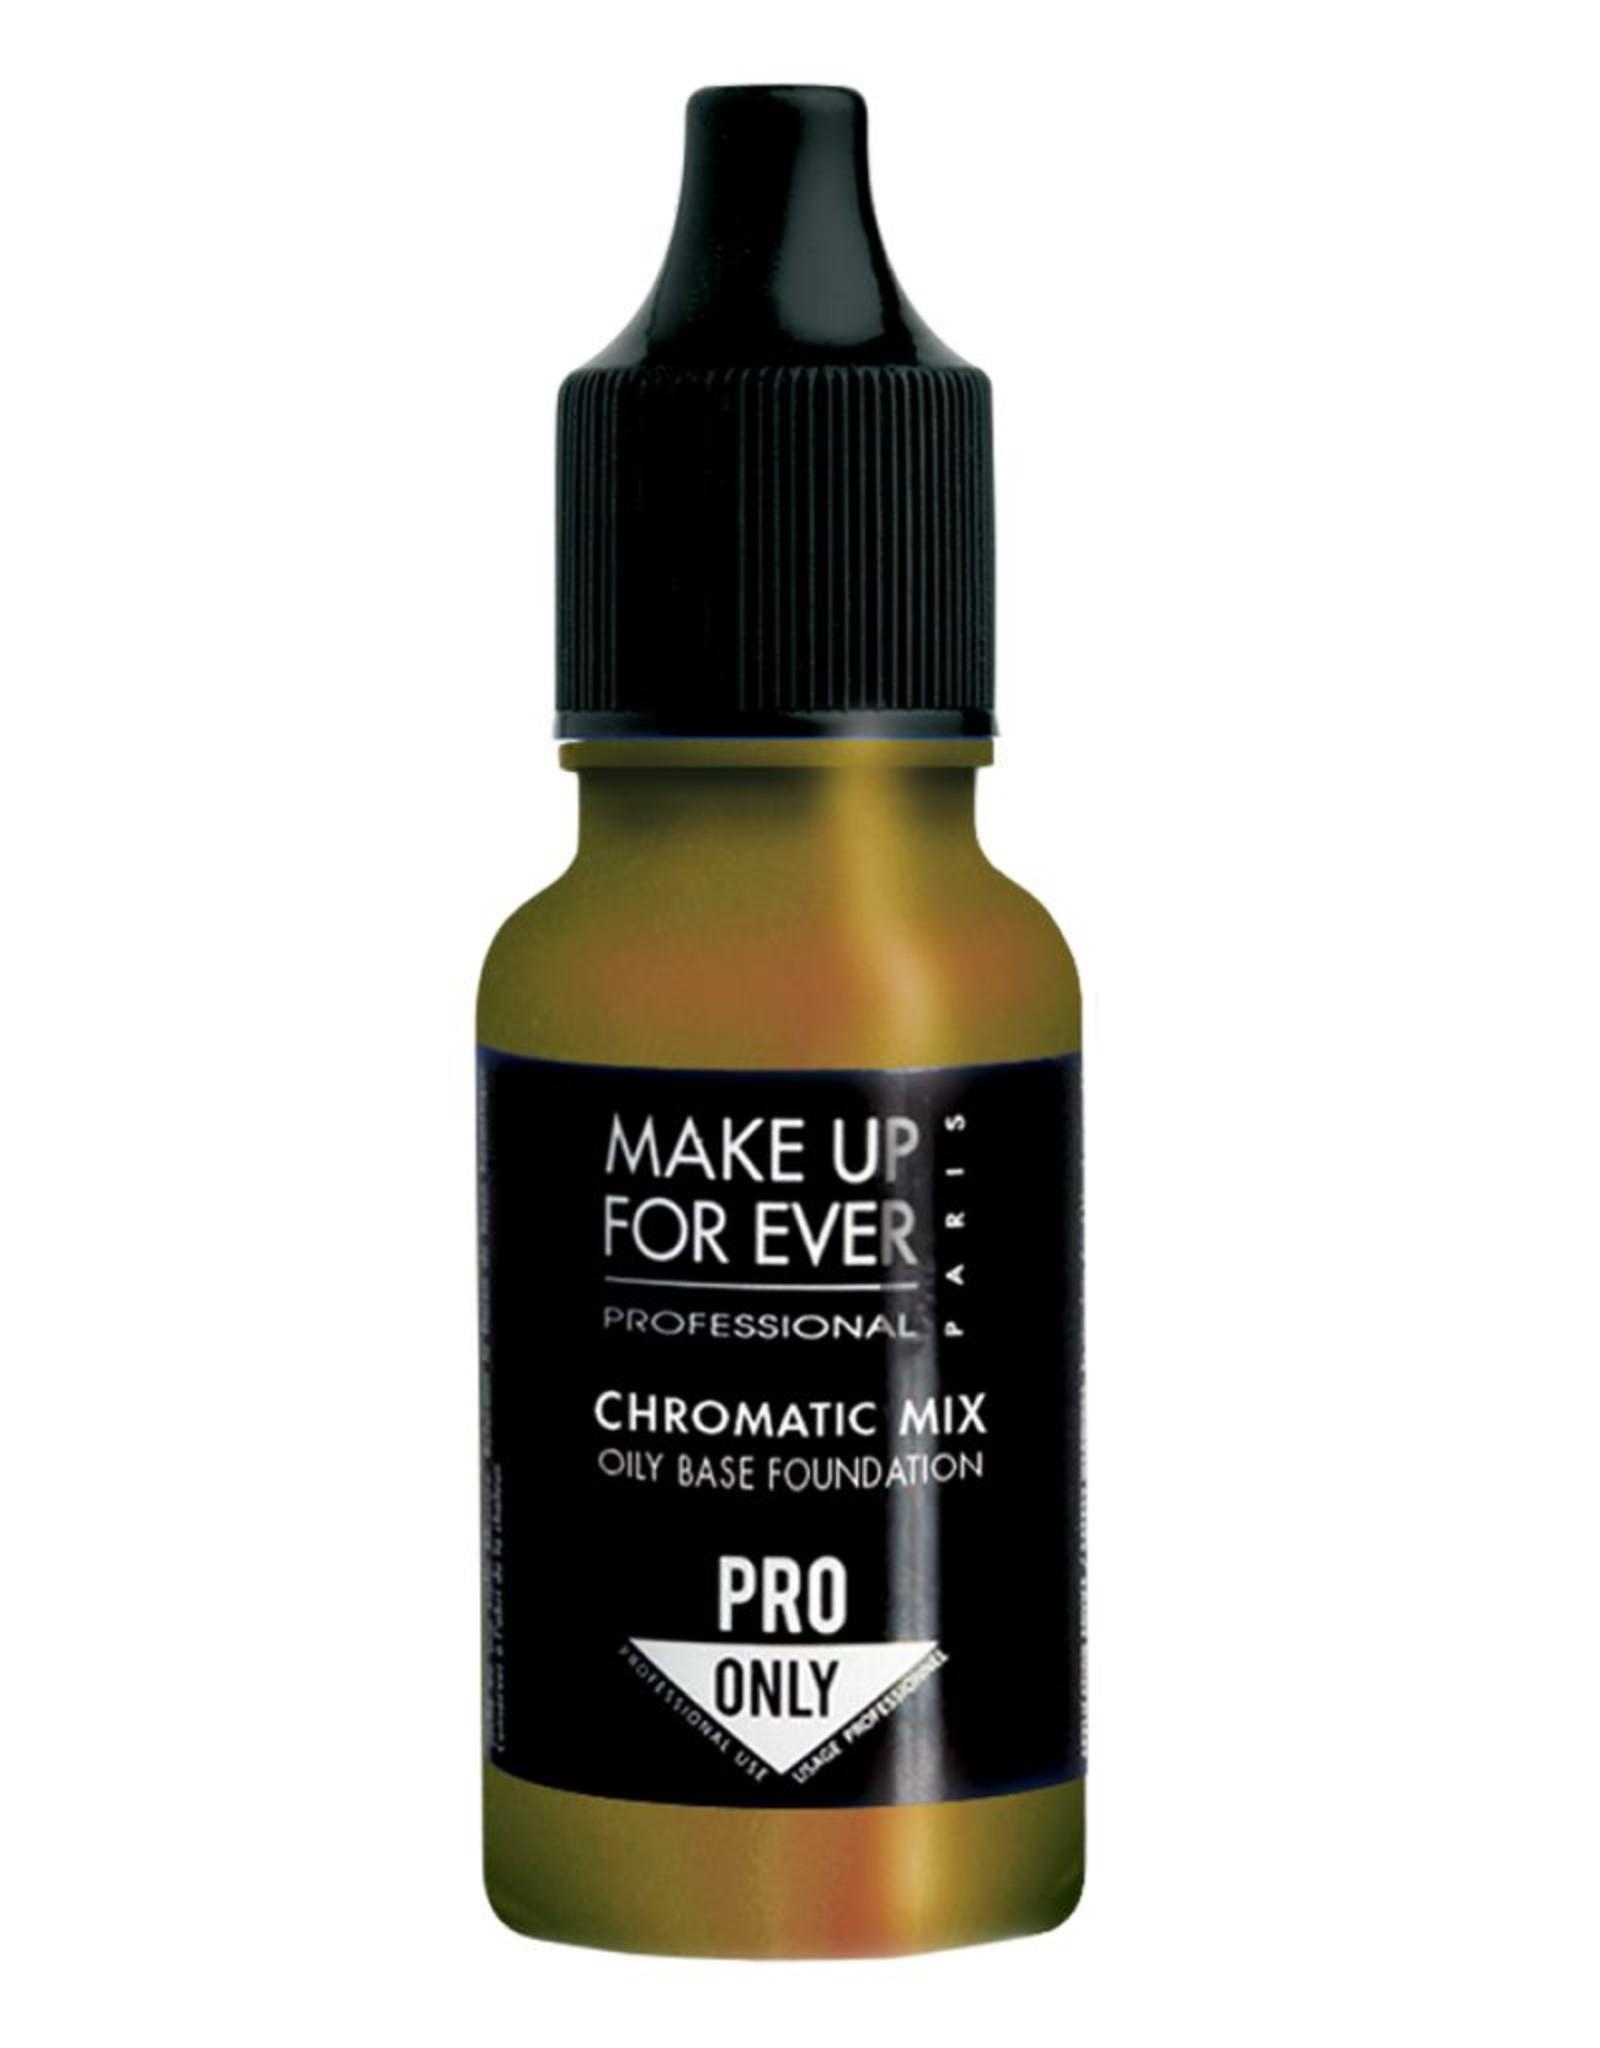 MUFE CHROMATIC MIX 13ML (Base Oil) #12 Jaune / Yellow